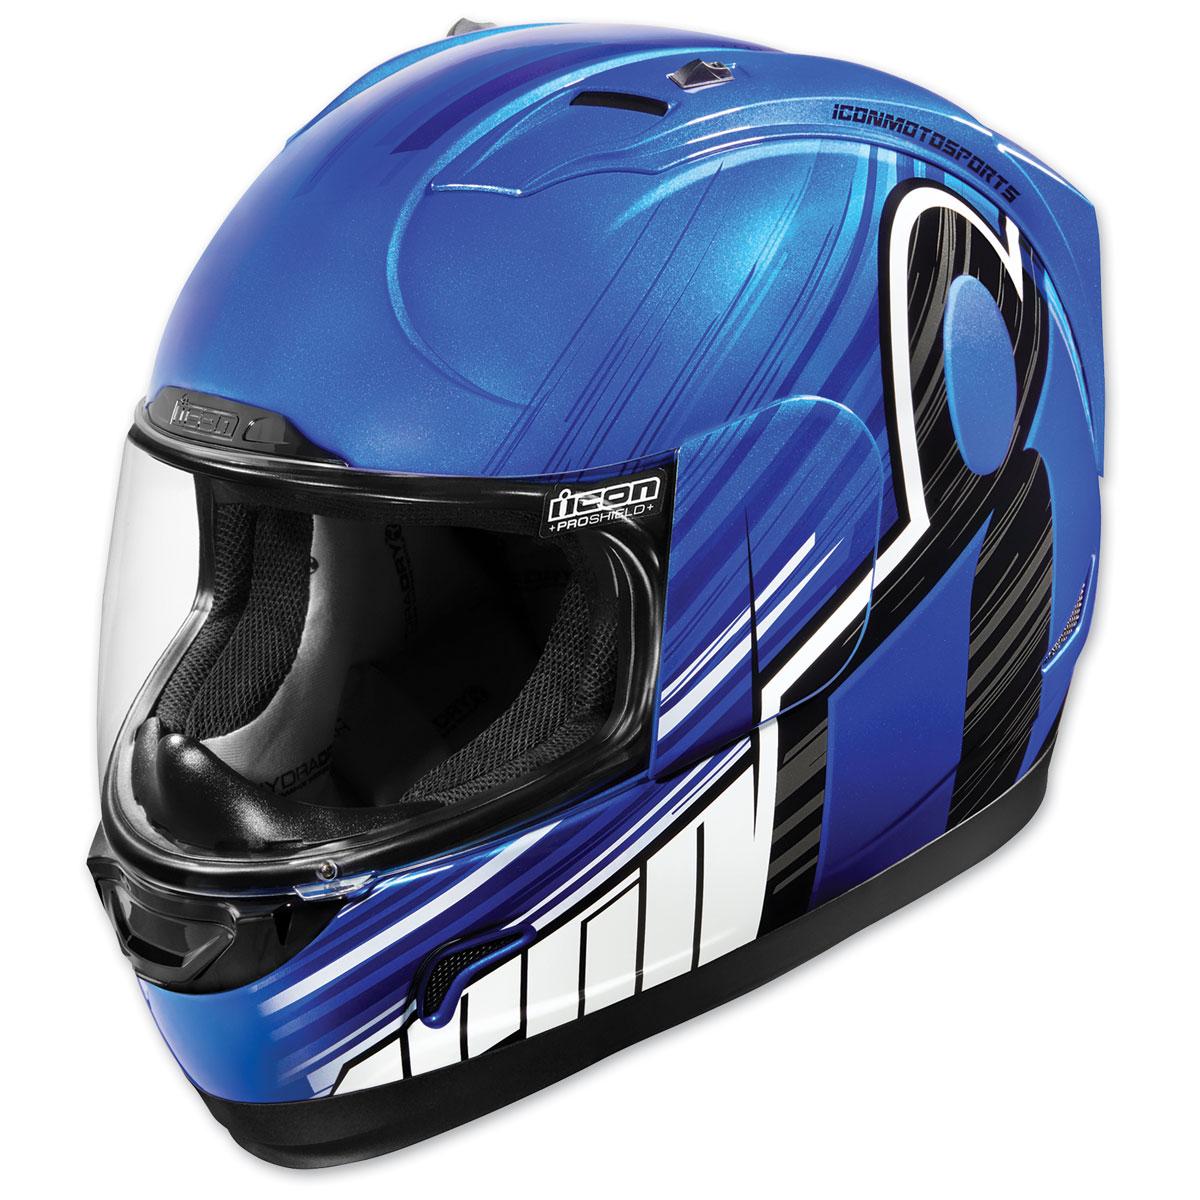 ICON Alliance Overlord Blue Full Face Helmet